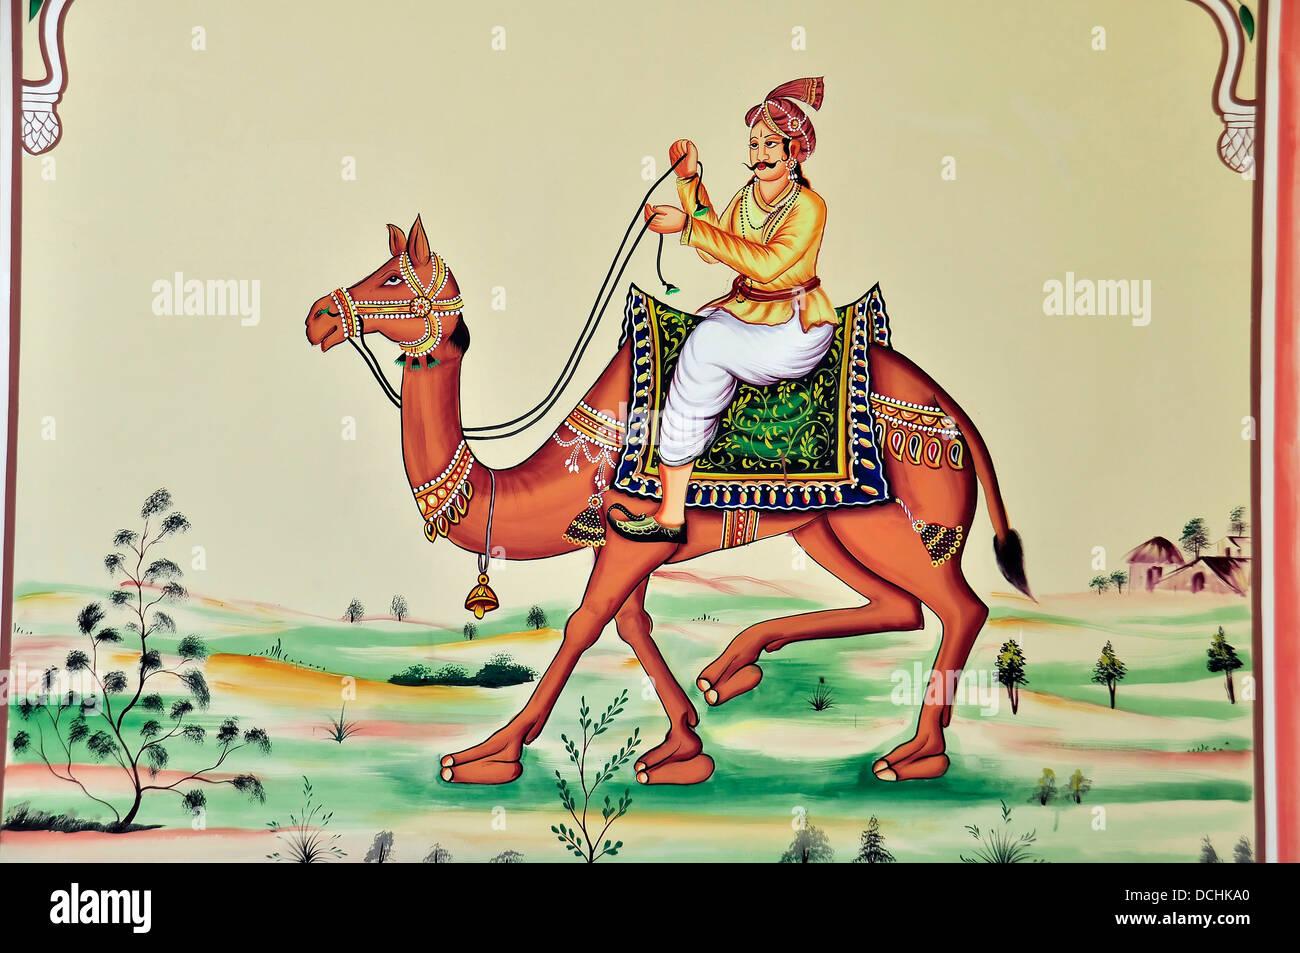 Pittura murale Rajput Warrior Camel Rajasthan in India Immagini Stock